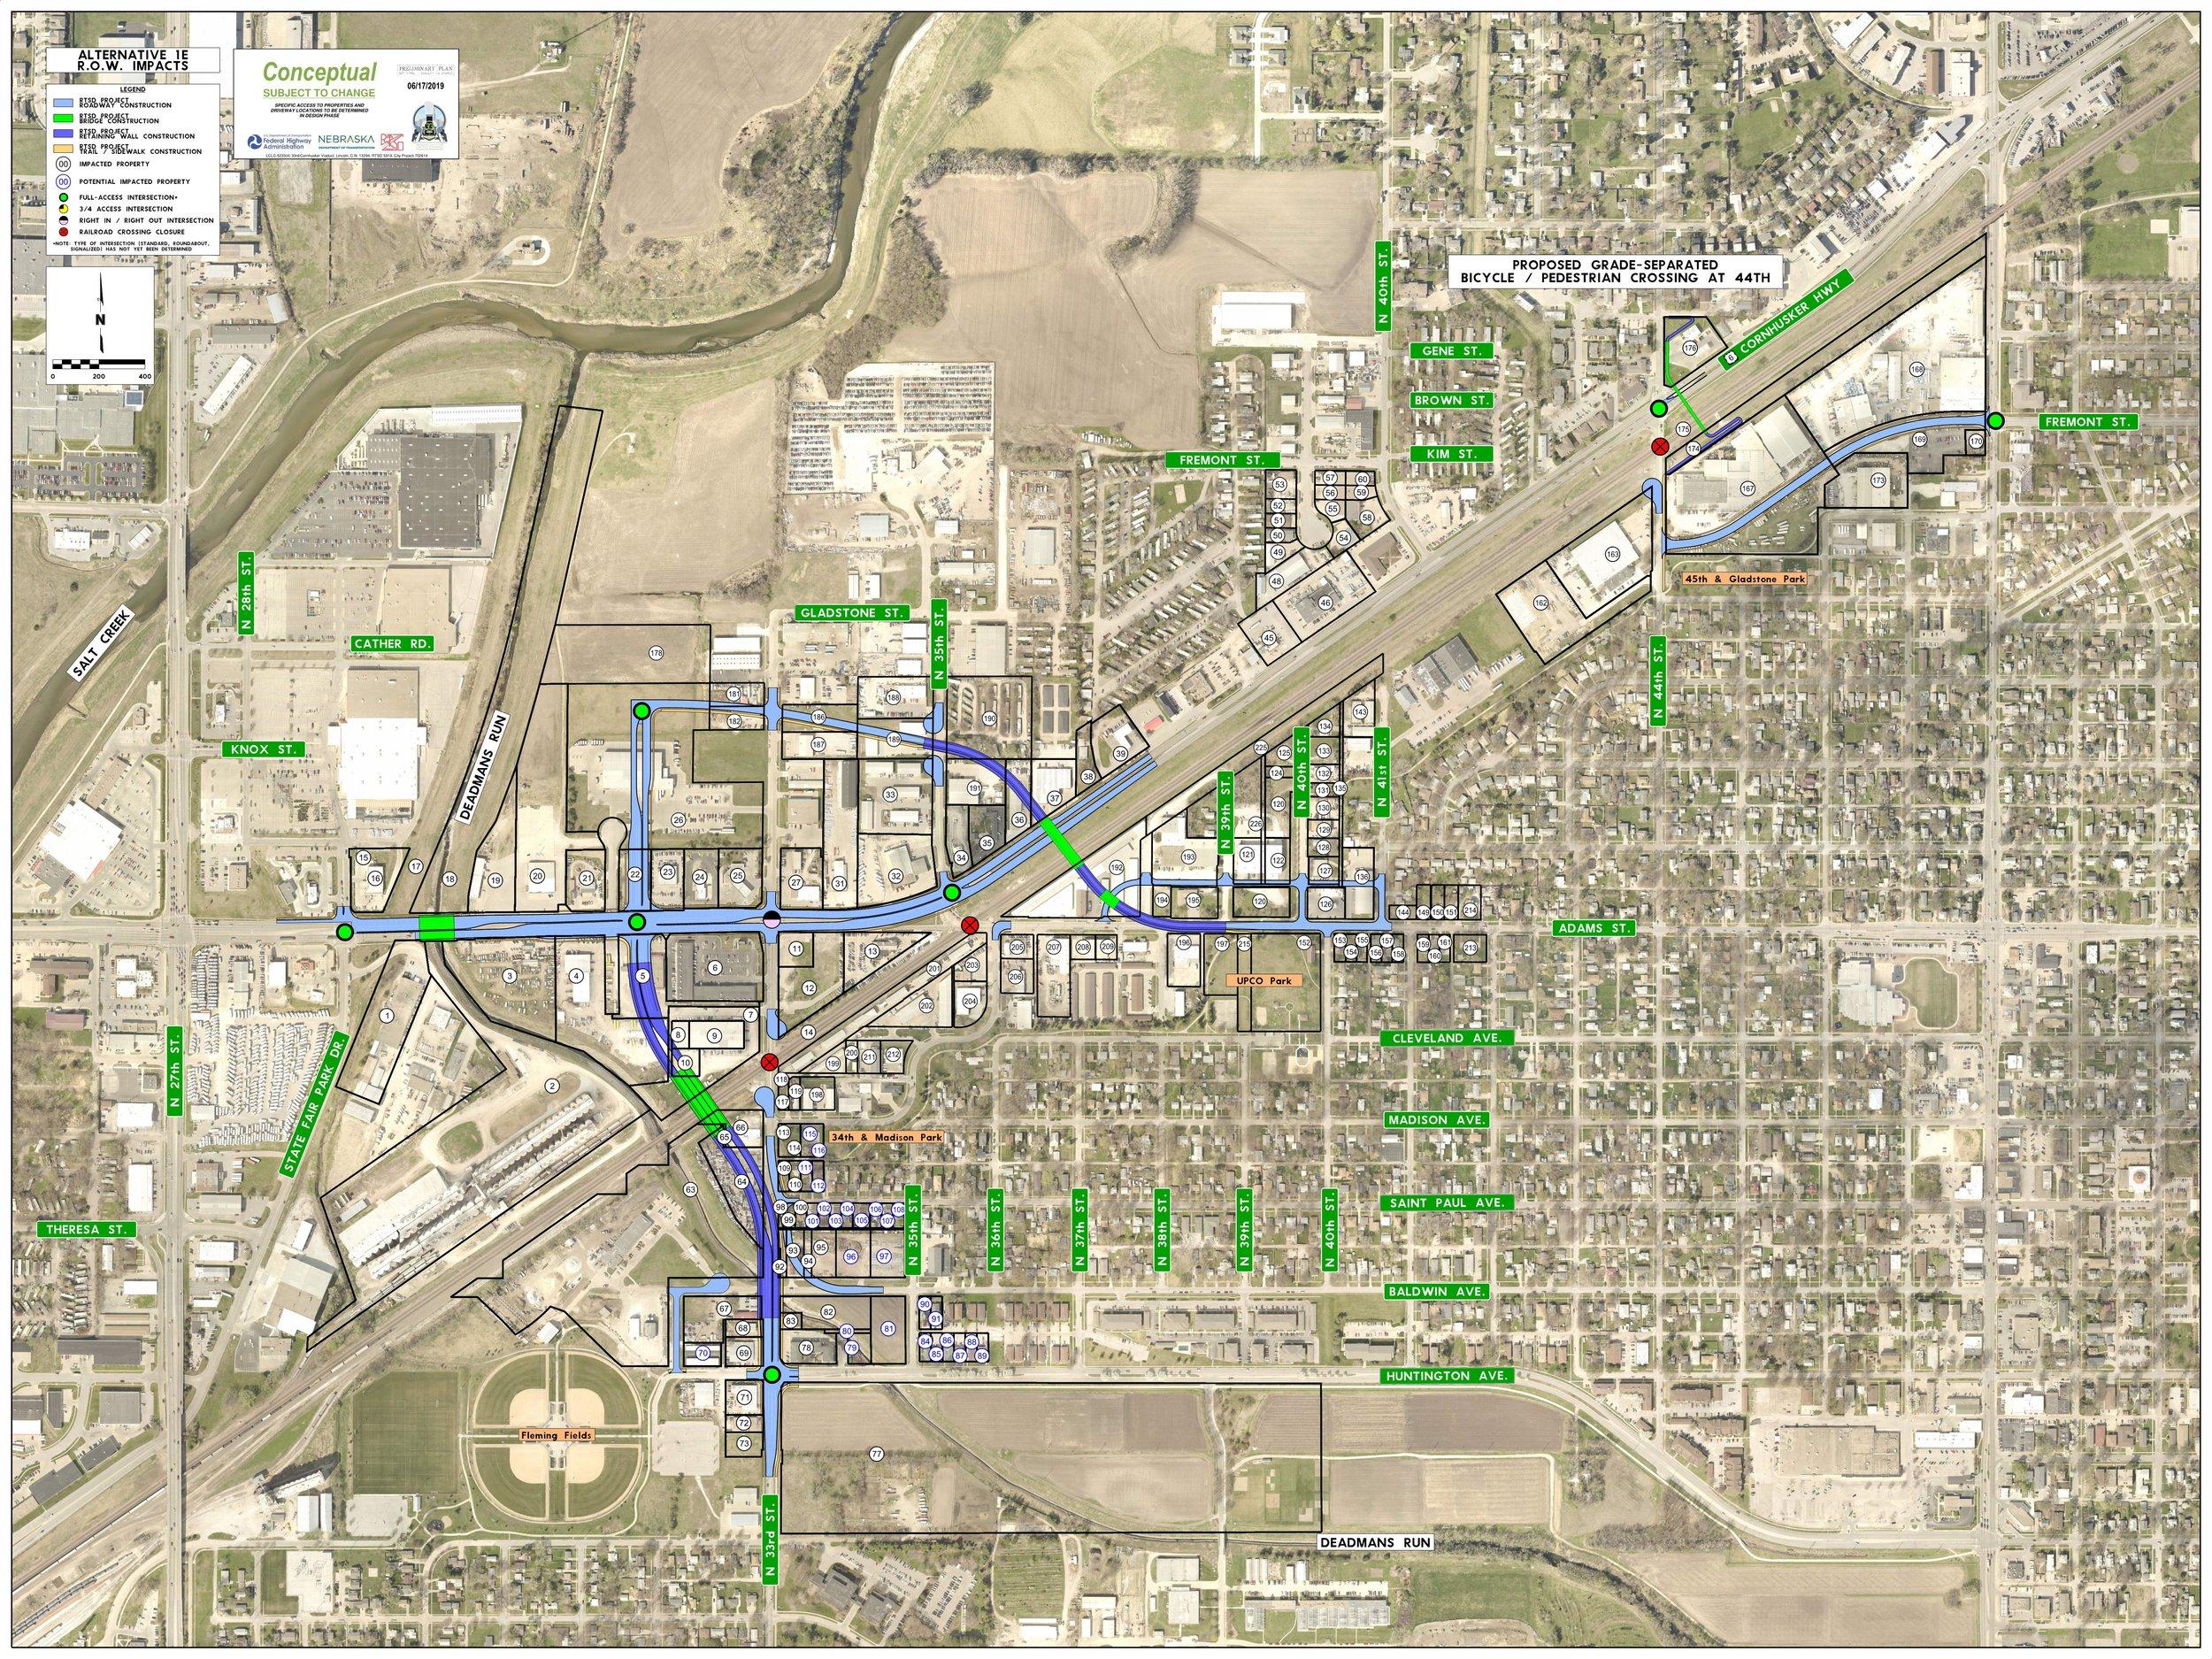 19-06-17_702614_33rd & Corn - ROW Impact Map 200 Scale_1E - Reduced.jpg